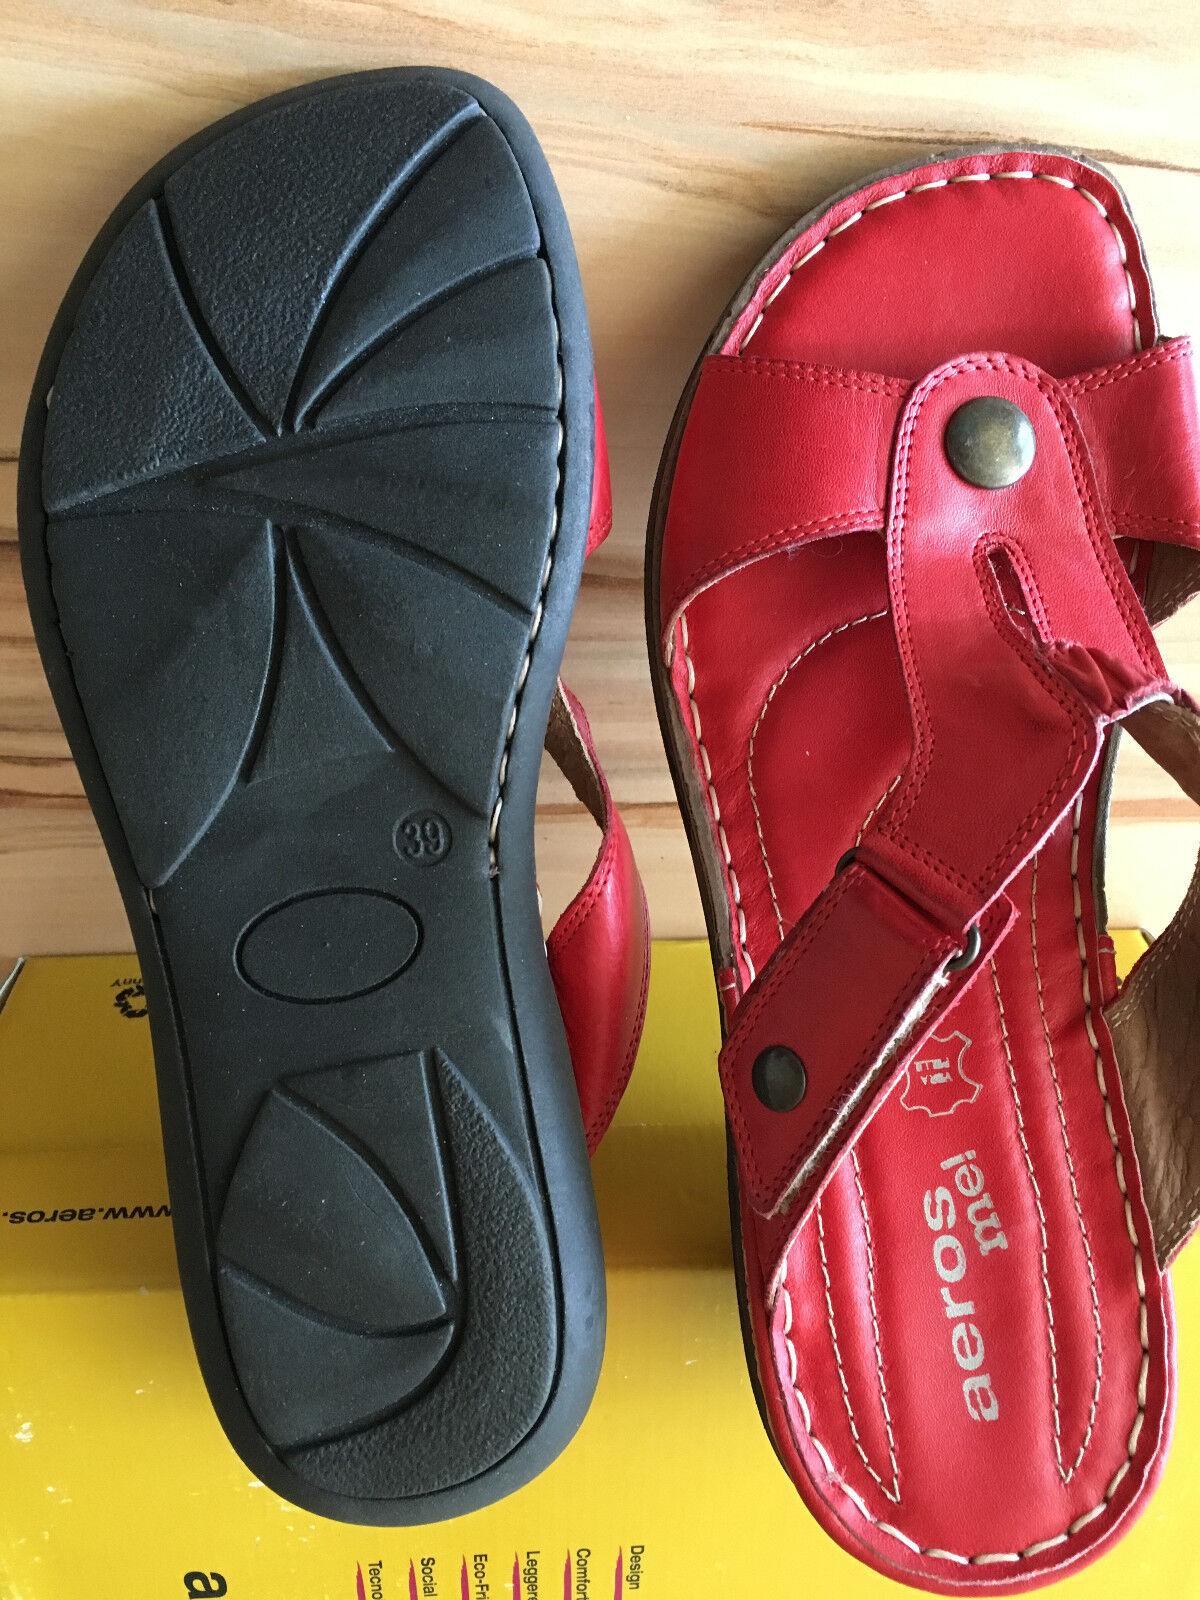 Aeors me  Made in Italy Leder Schuhe Neu Sandalen Gr. 38, Rot, Neu Schuhe mit Karton 2c44c2